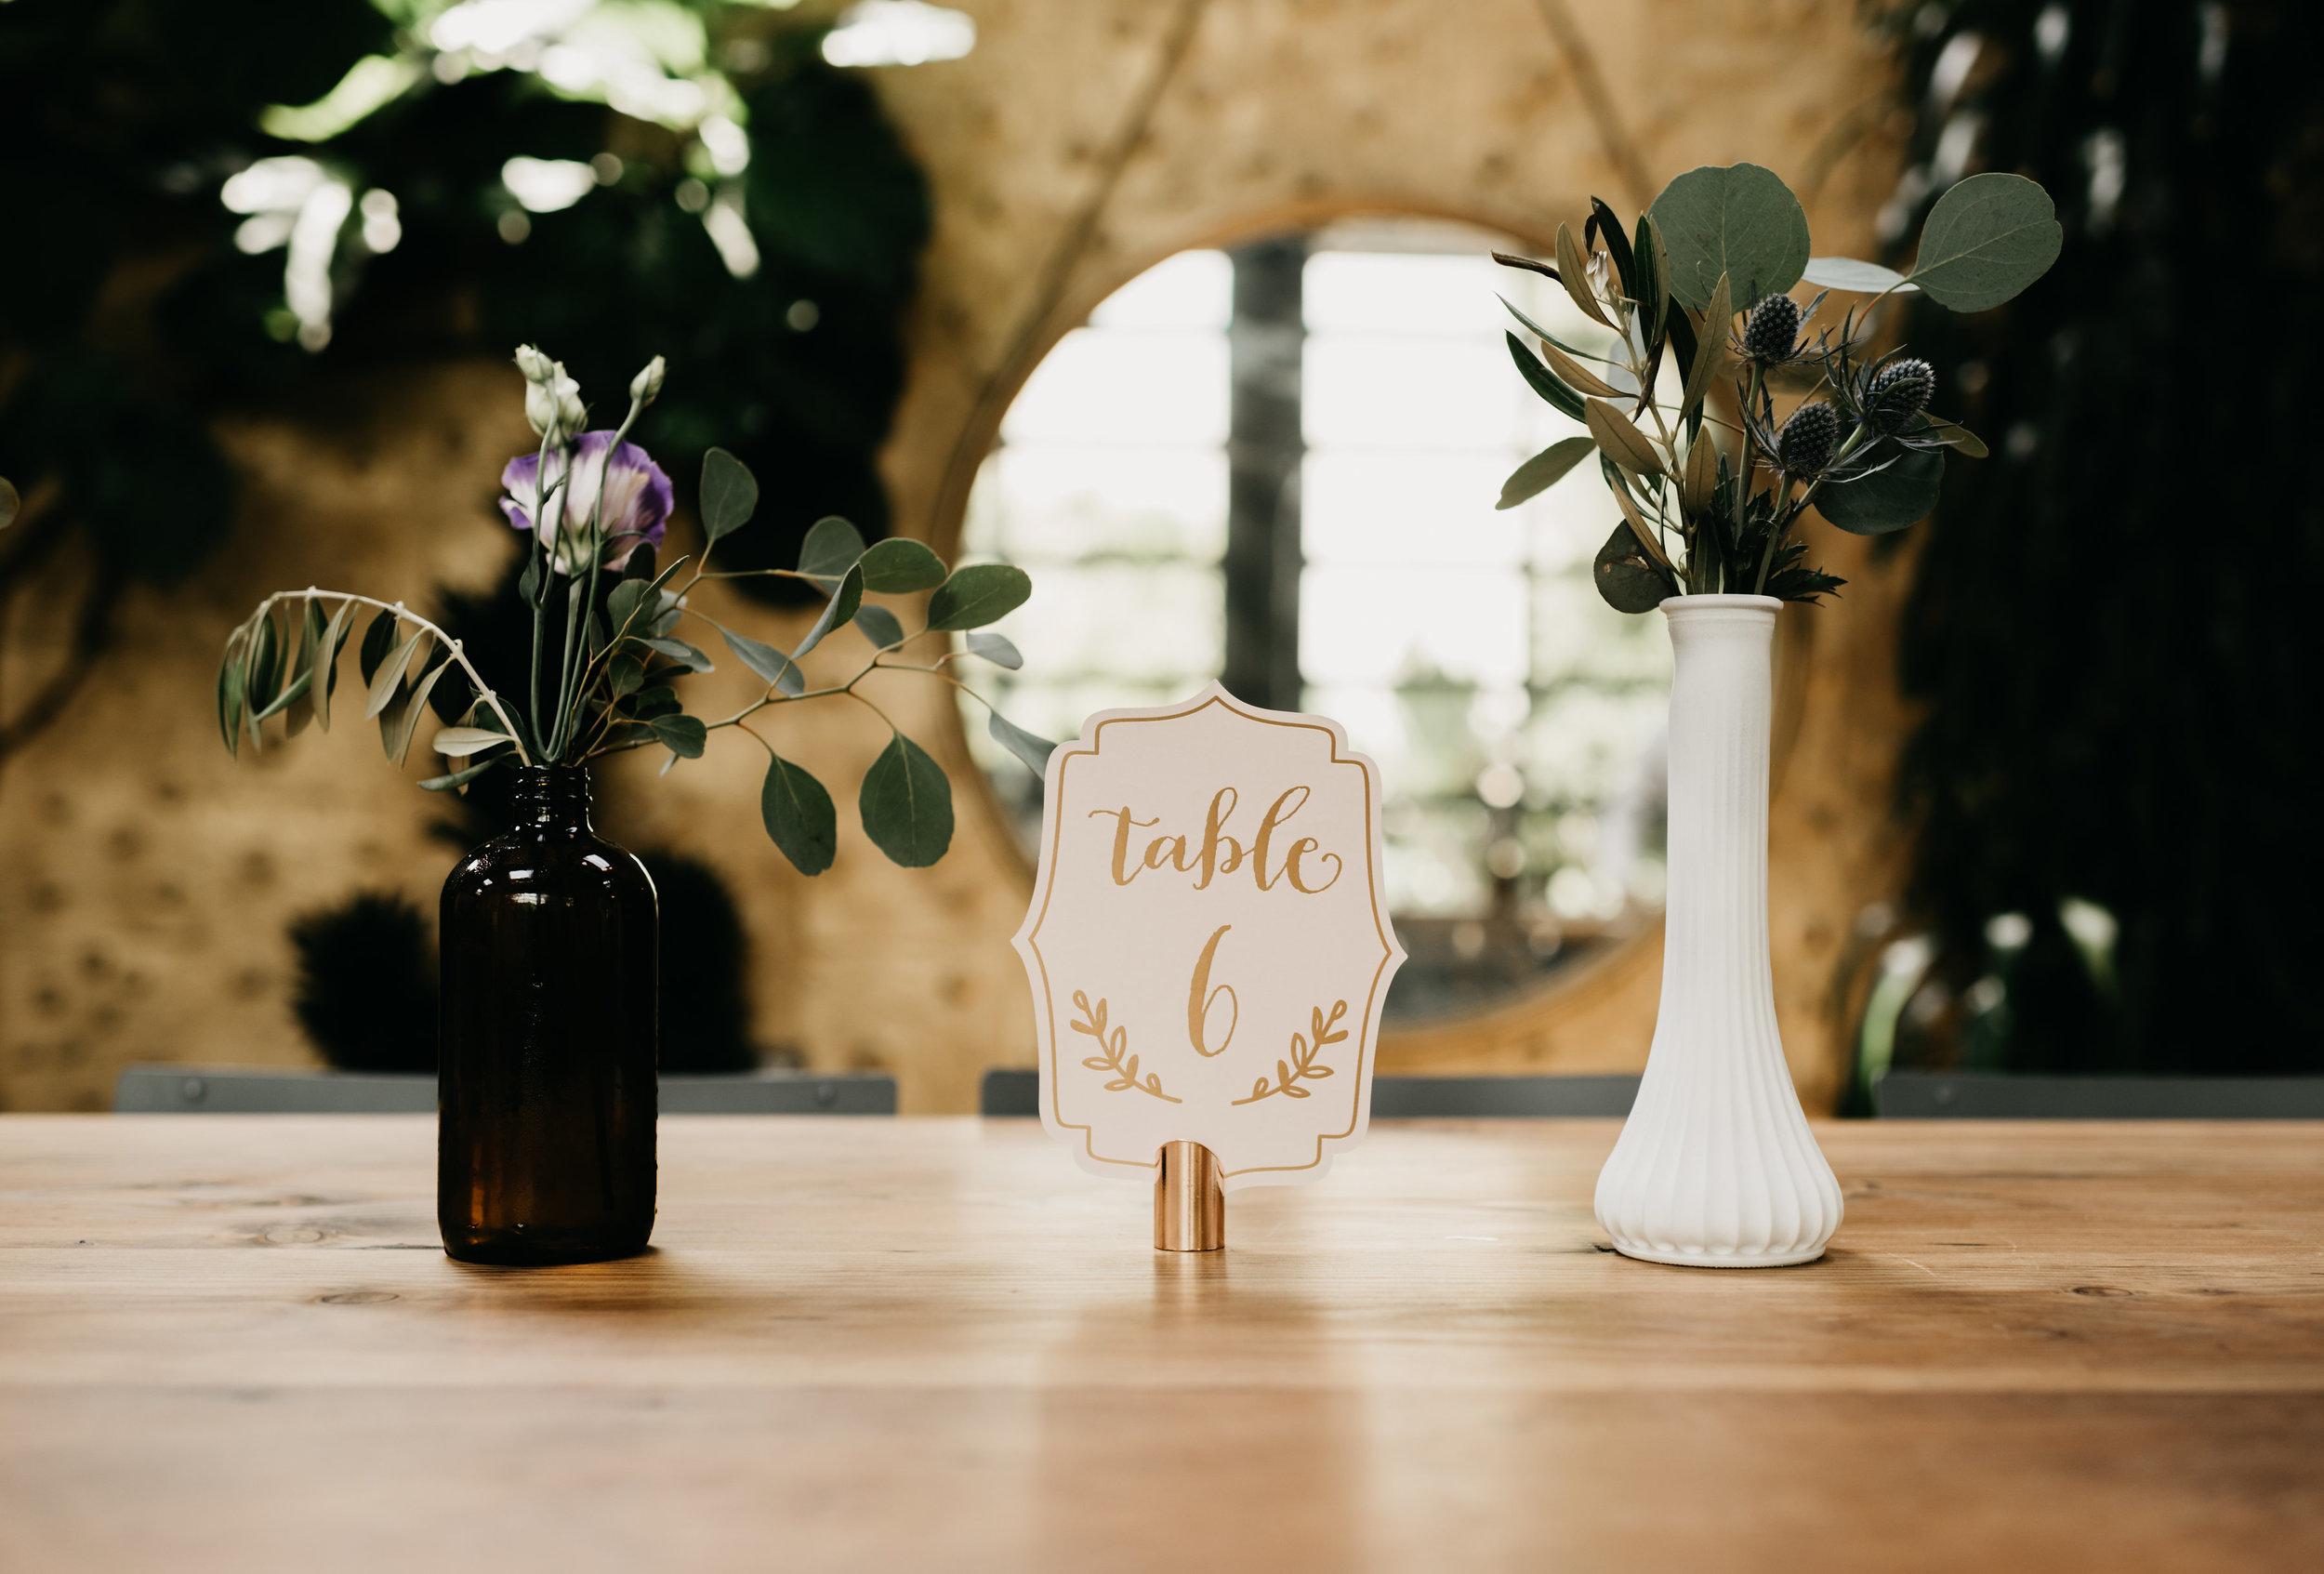 Millwick-wedding-planner120.jpg